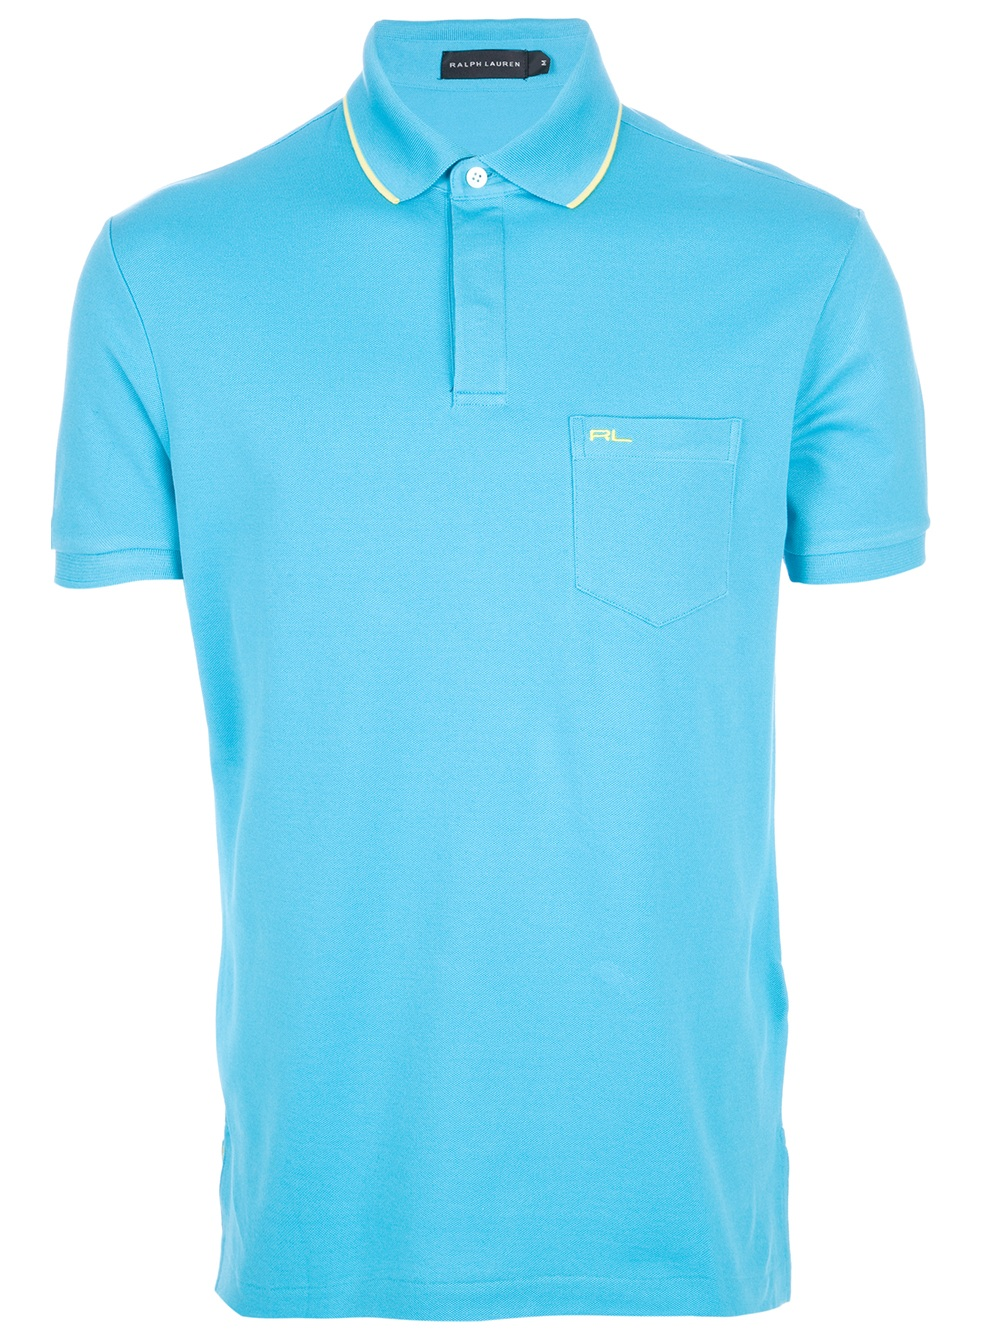 Ralph lauren black label logo polo shirt in blue for men for Ralph lauren logo shirt